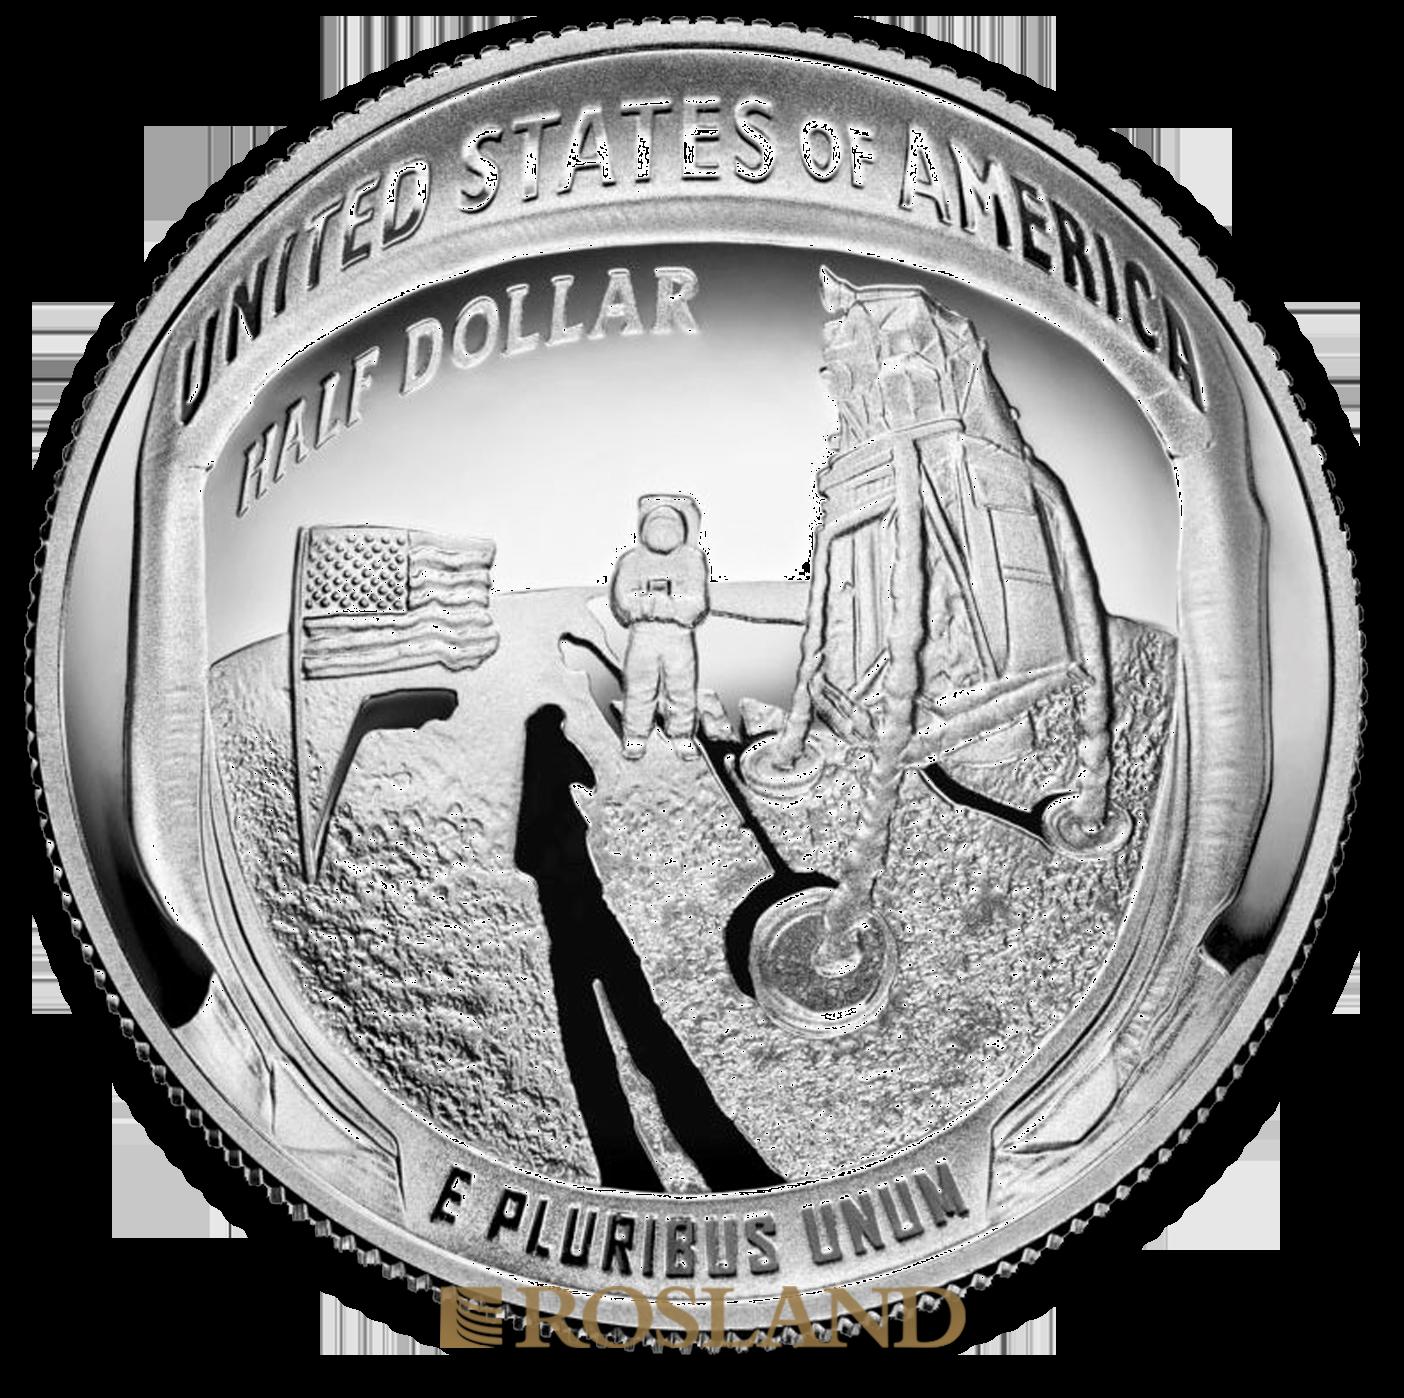 1 Unze 2 Münzen RAM/US Mint Apollo 11 Mondlandung Set 2019 PP (Box, Zertifikat)